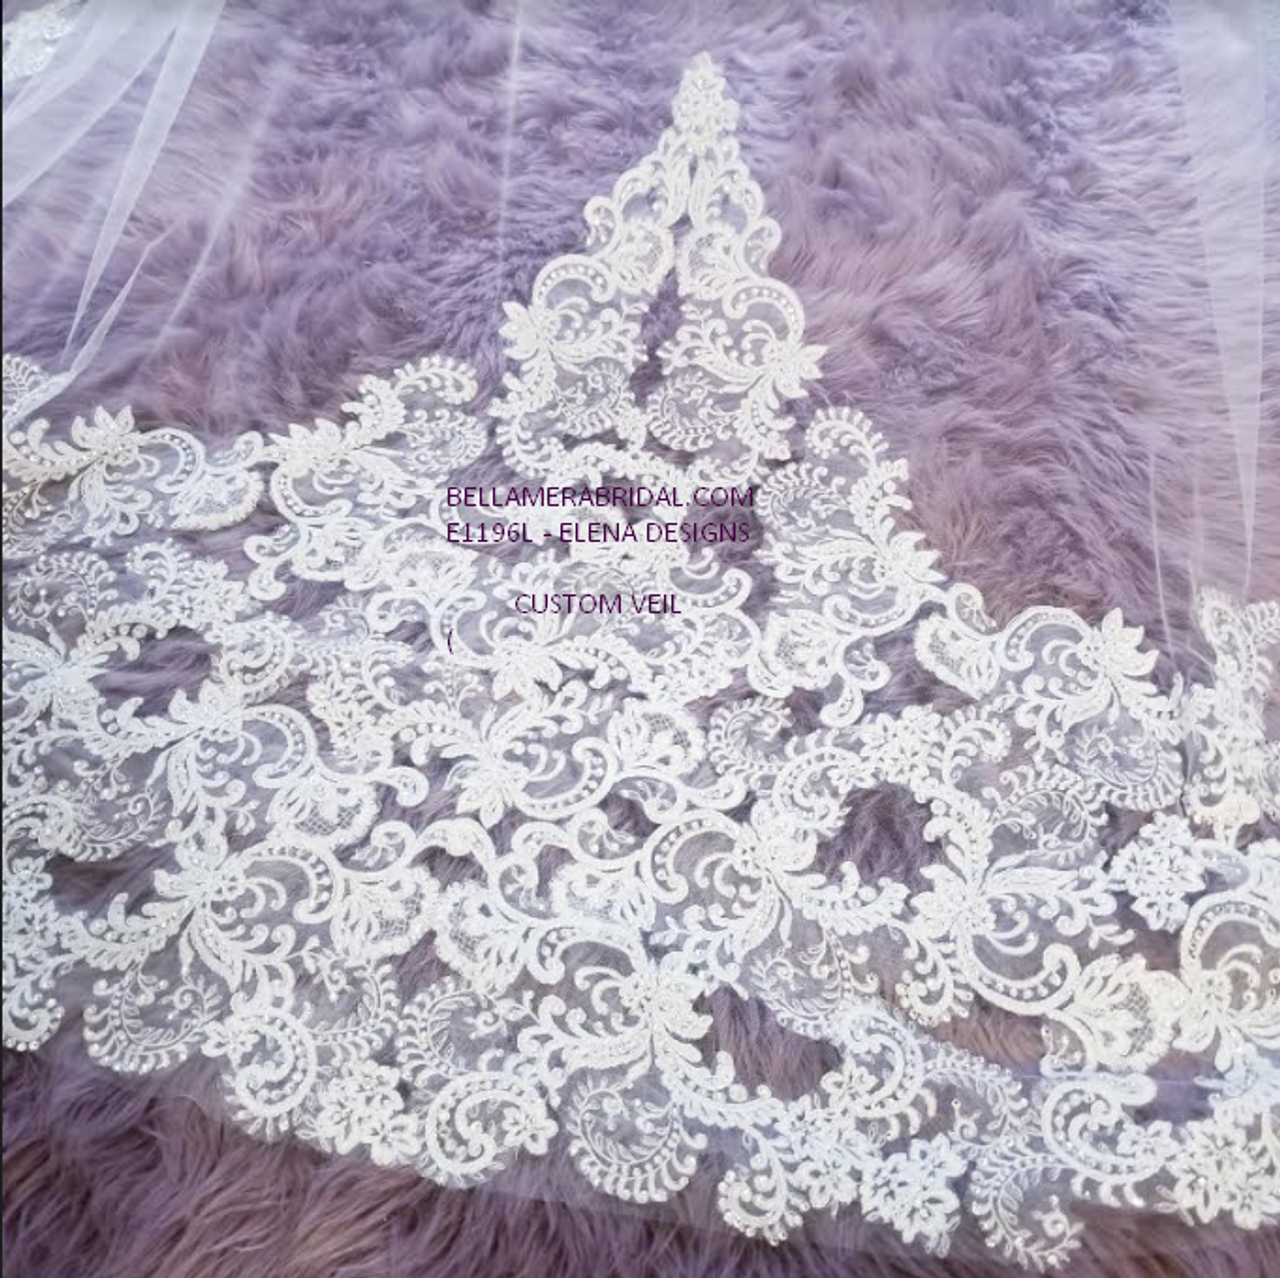 Elena Designs Wedding Veil Style E1196L - Cathedral Beaded Lace  edge veil - 120x108